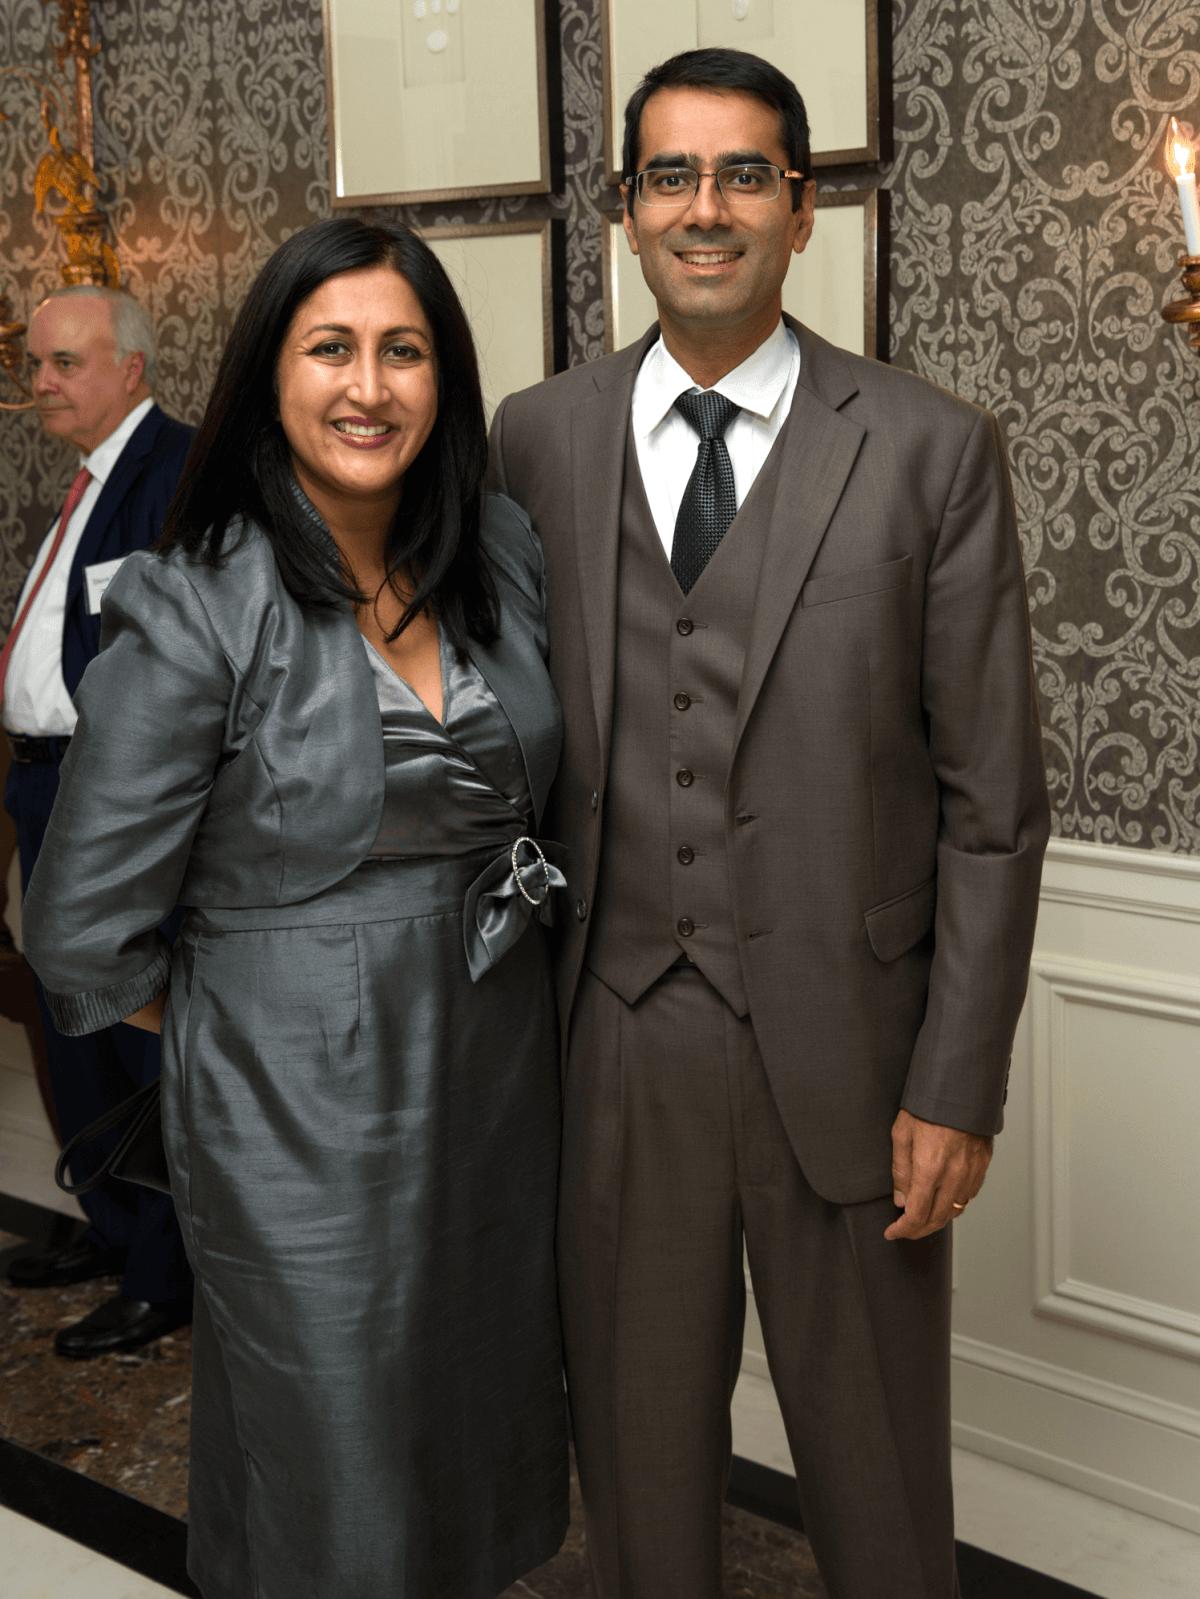 Houston, Legal Community's Harvest Celebration, Nov 2016, Sameera Mahendru, Ashish Mahendru